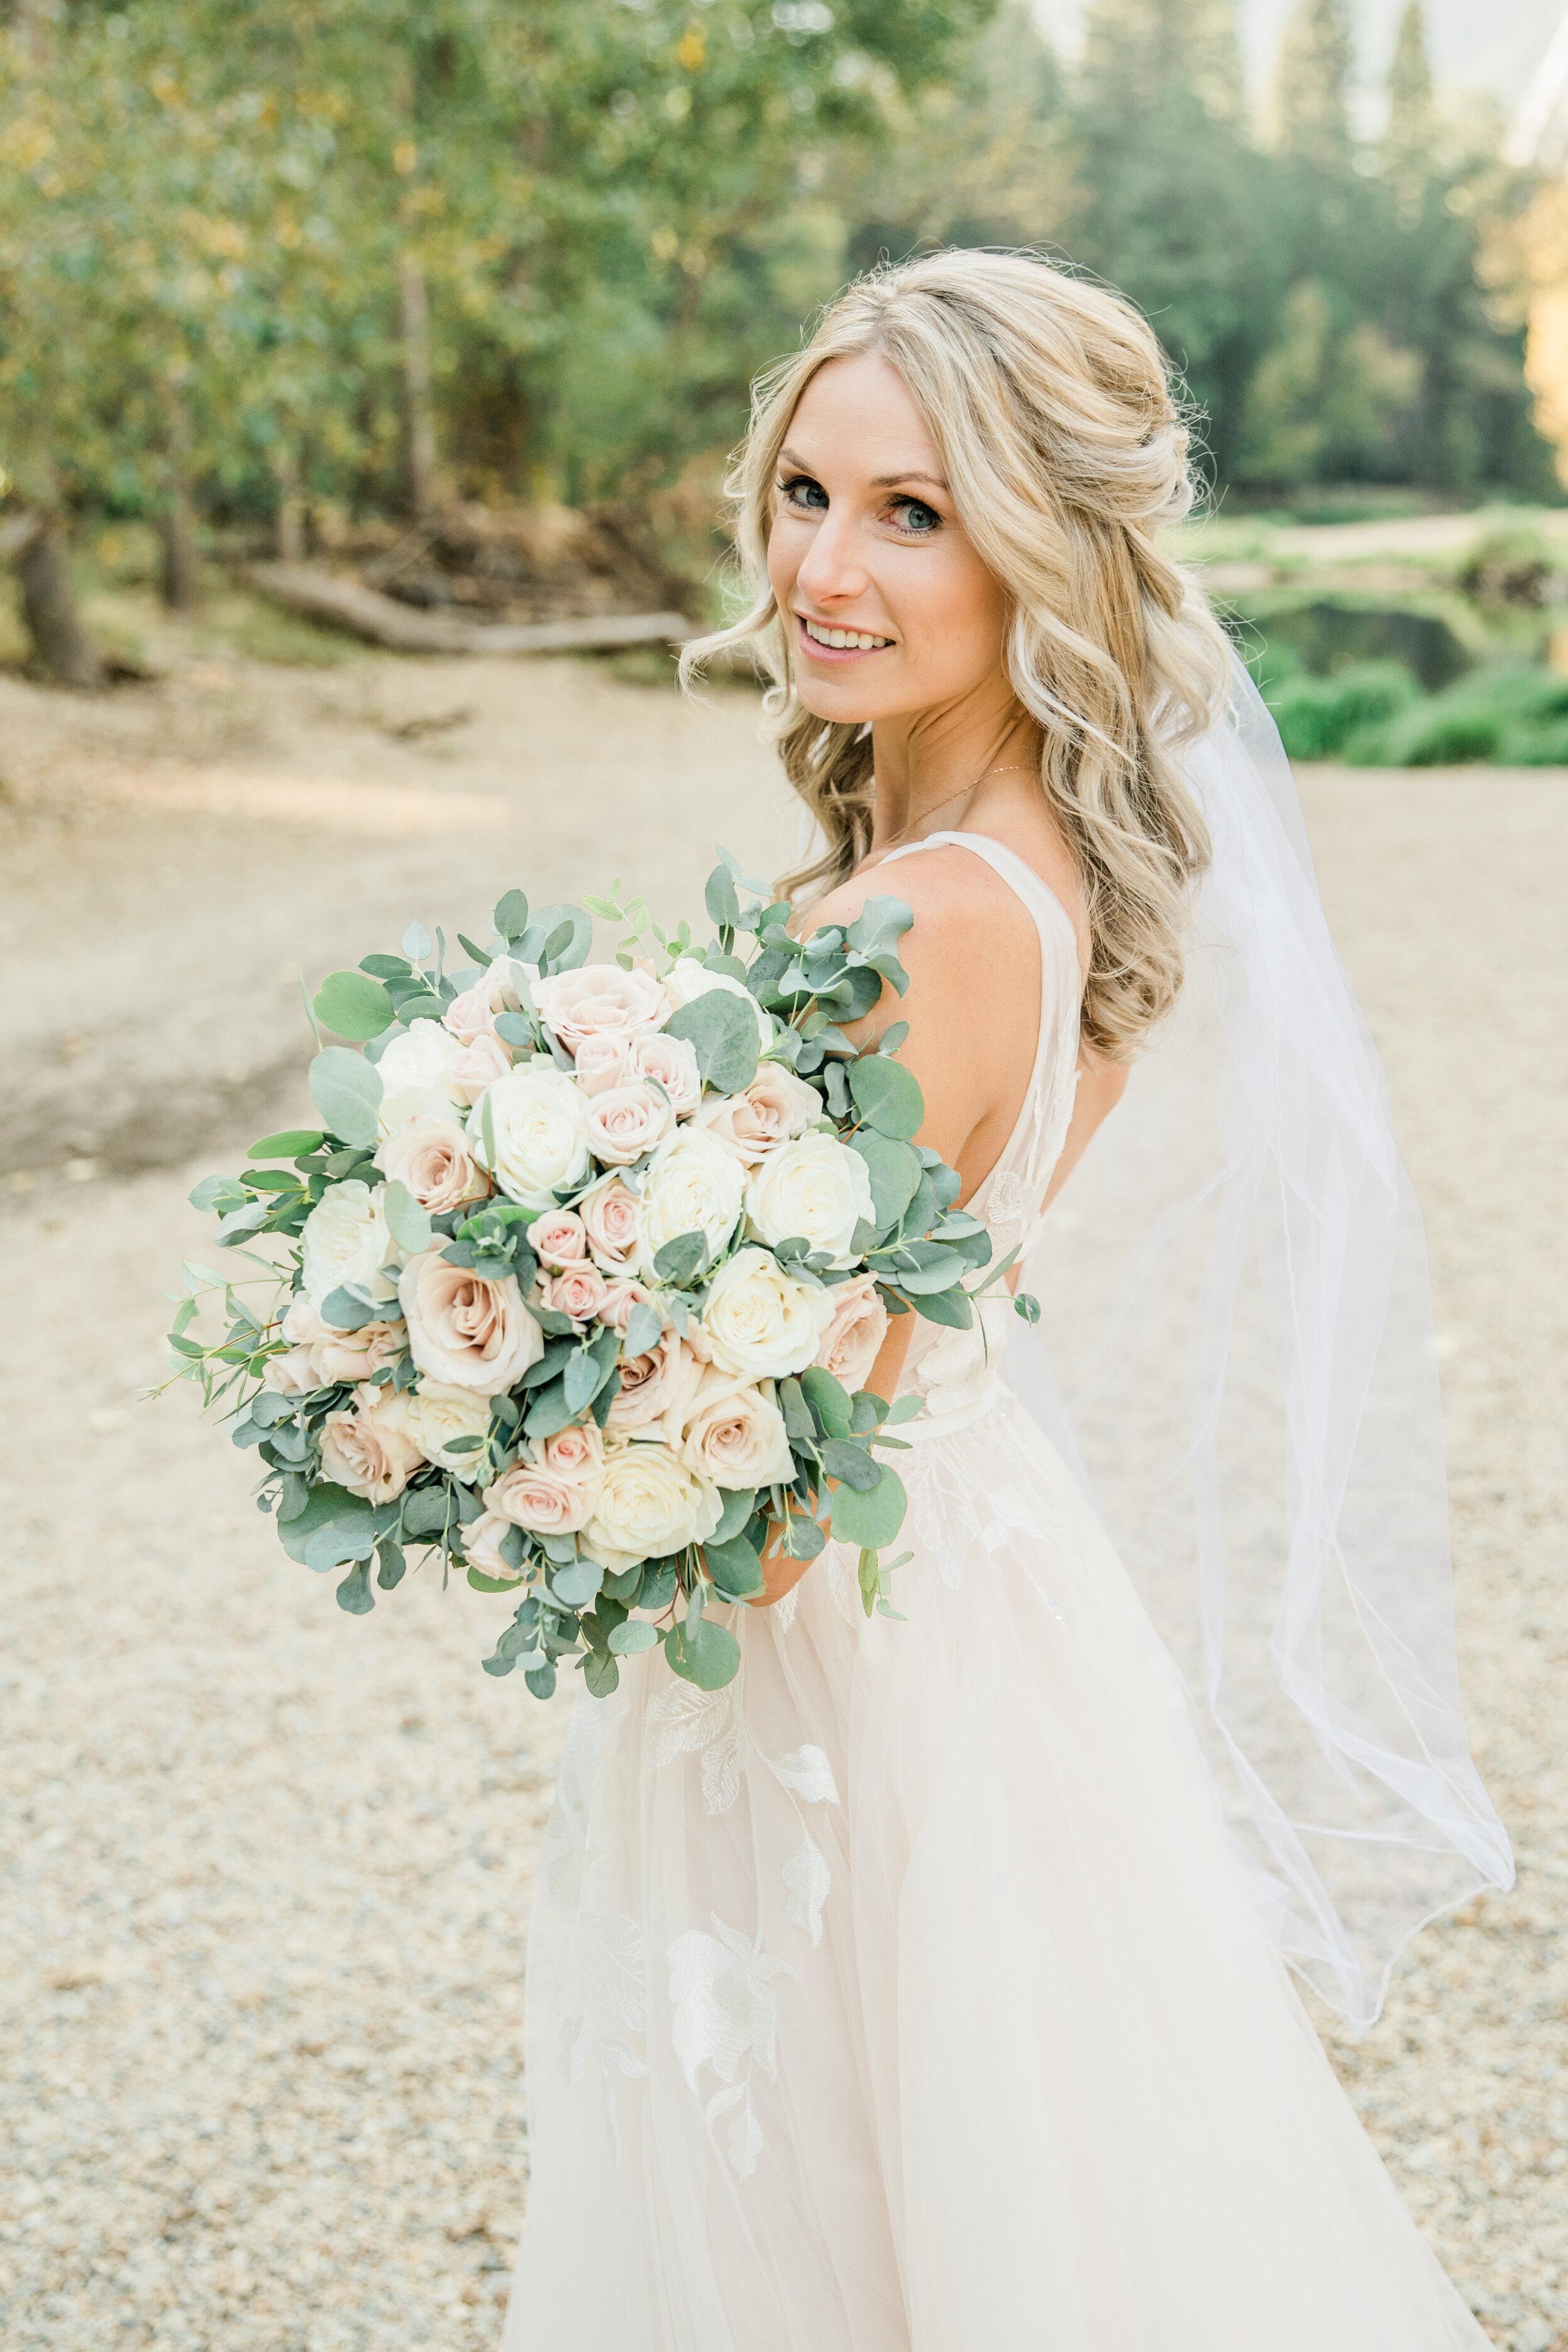 Leanne and Joe - Married - Sneak Peeks - Lauren Alisse Photography-31.jpg